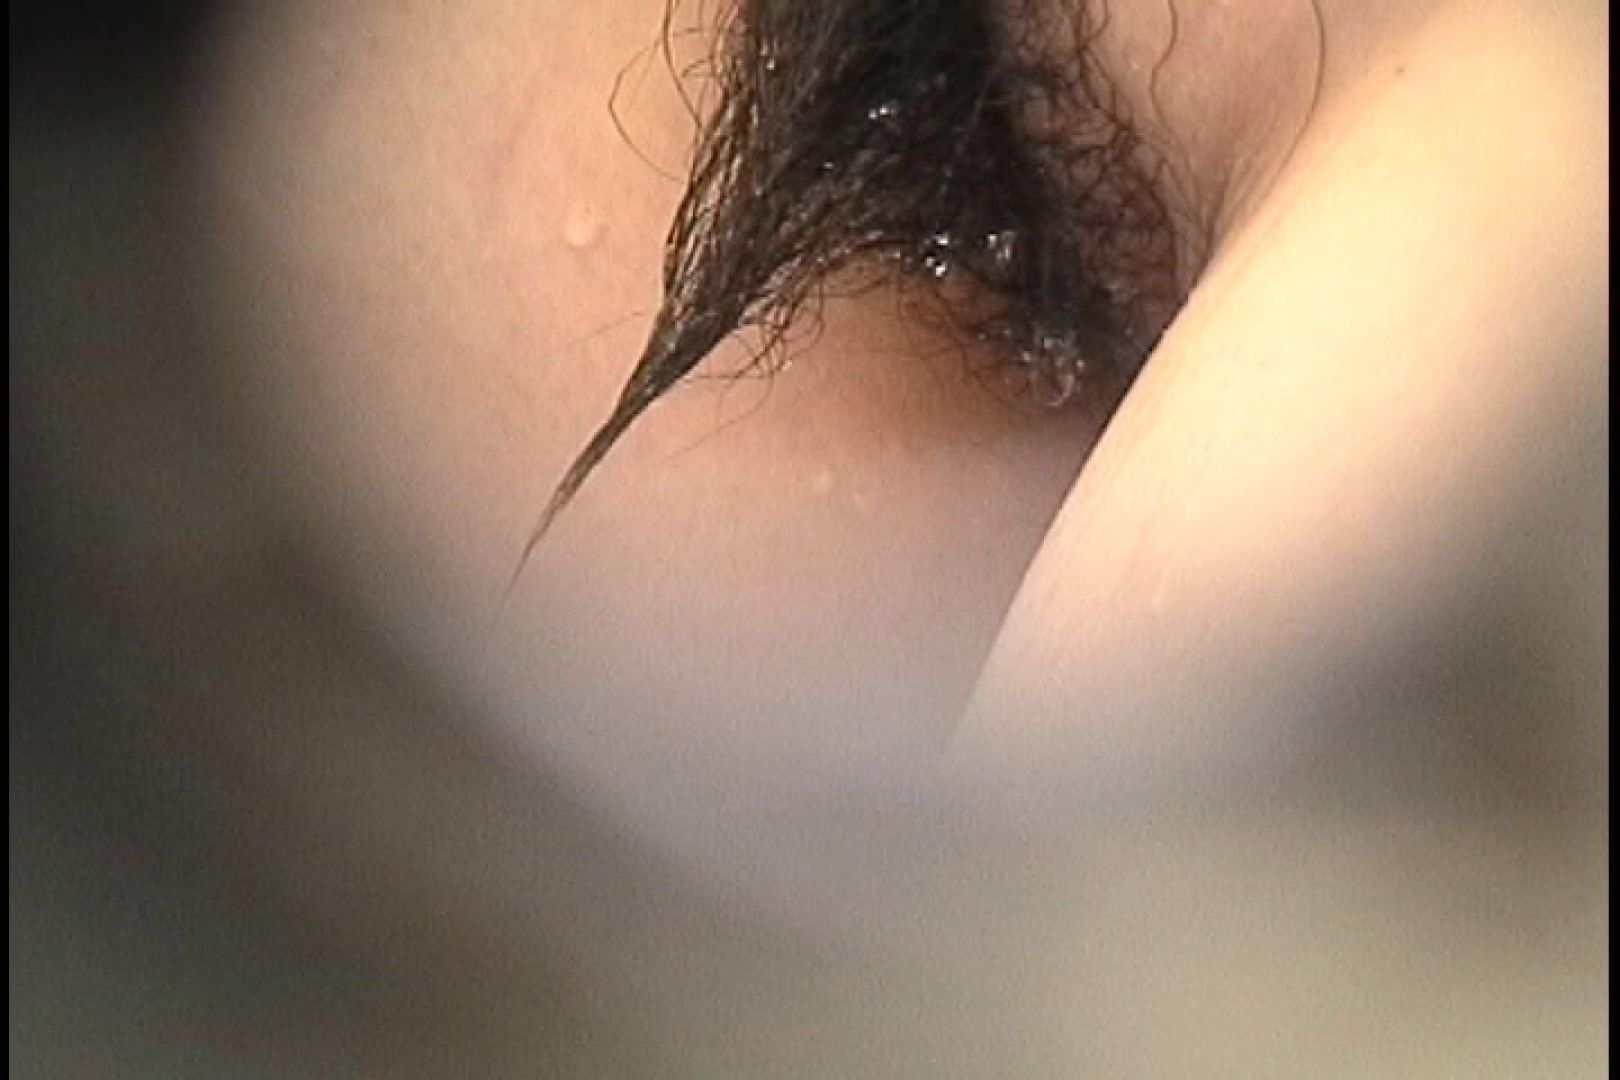 No.107 さすがの画質!濃い陰毛に阻まれ道が見えません エッチな乙女 | シャワー  102枚 49